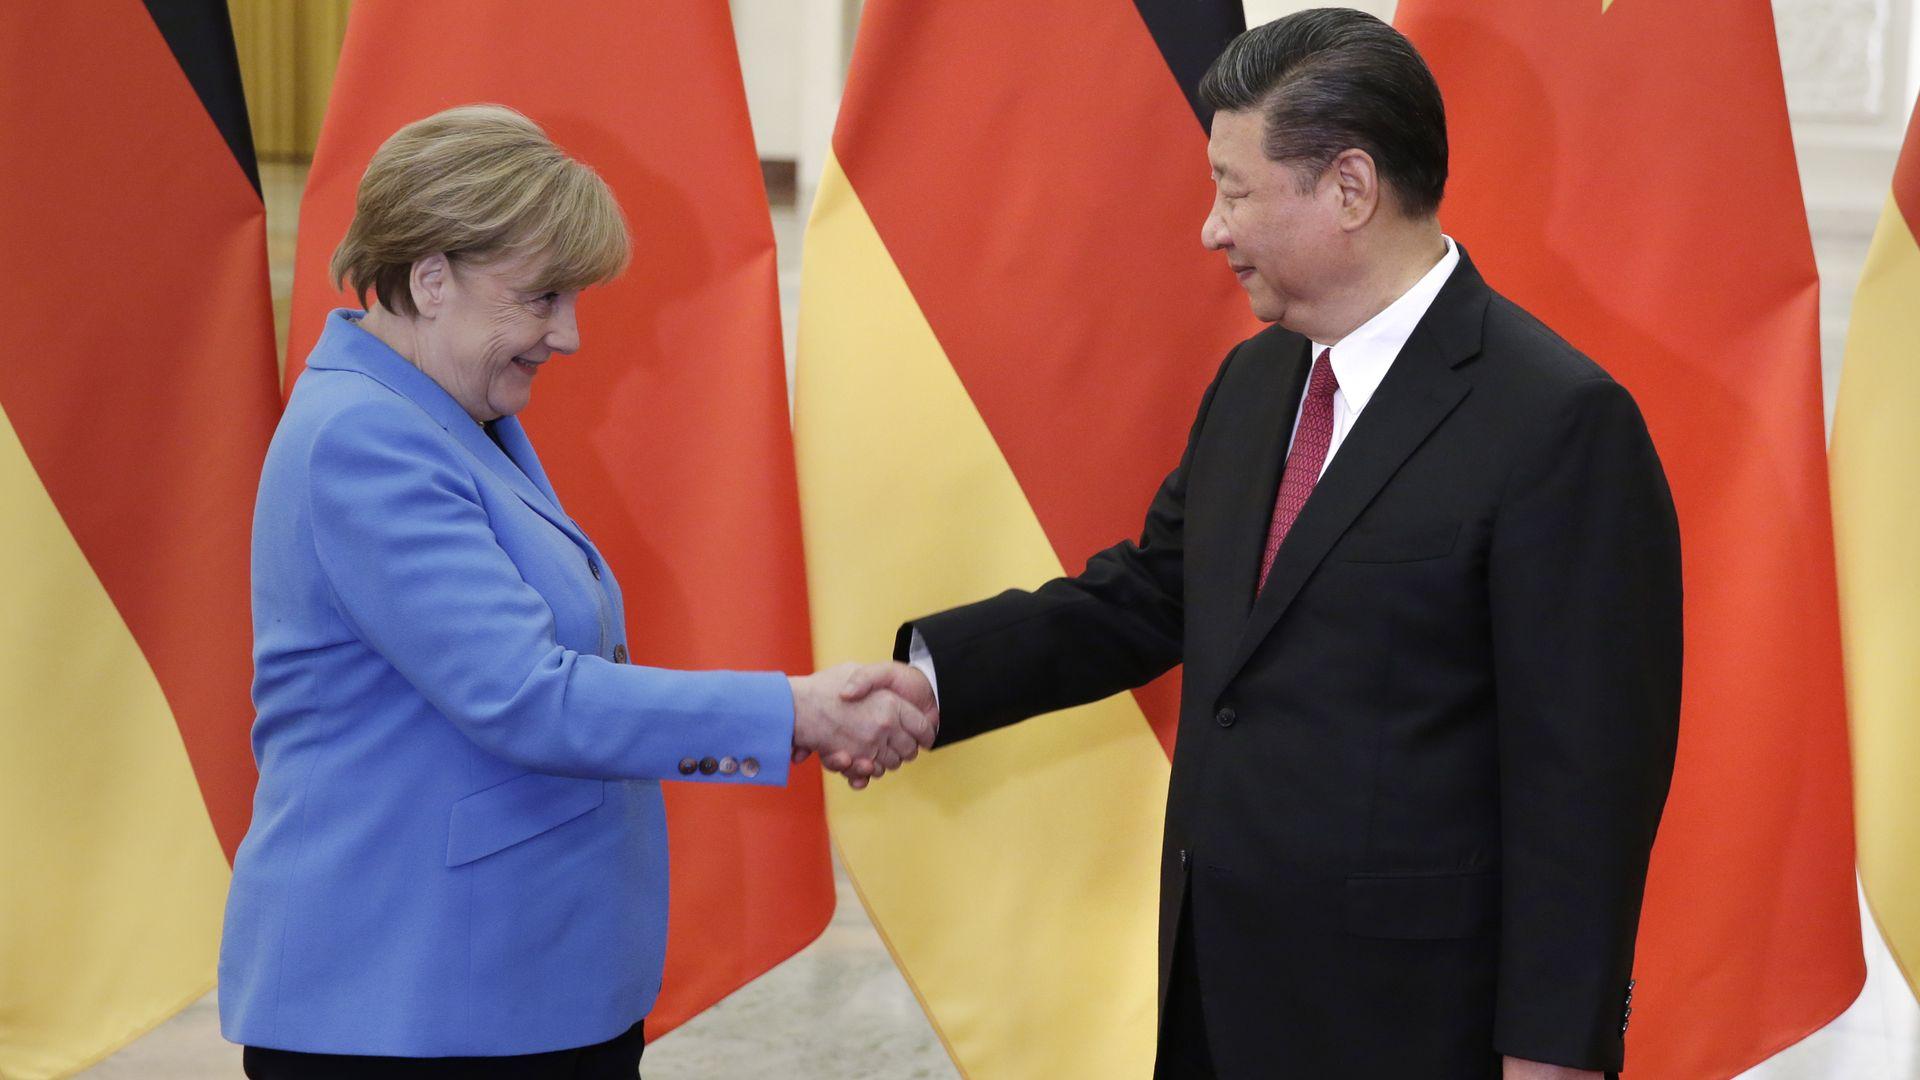 Angela Merkel Warns Against Demonizing China For Its Success Axios